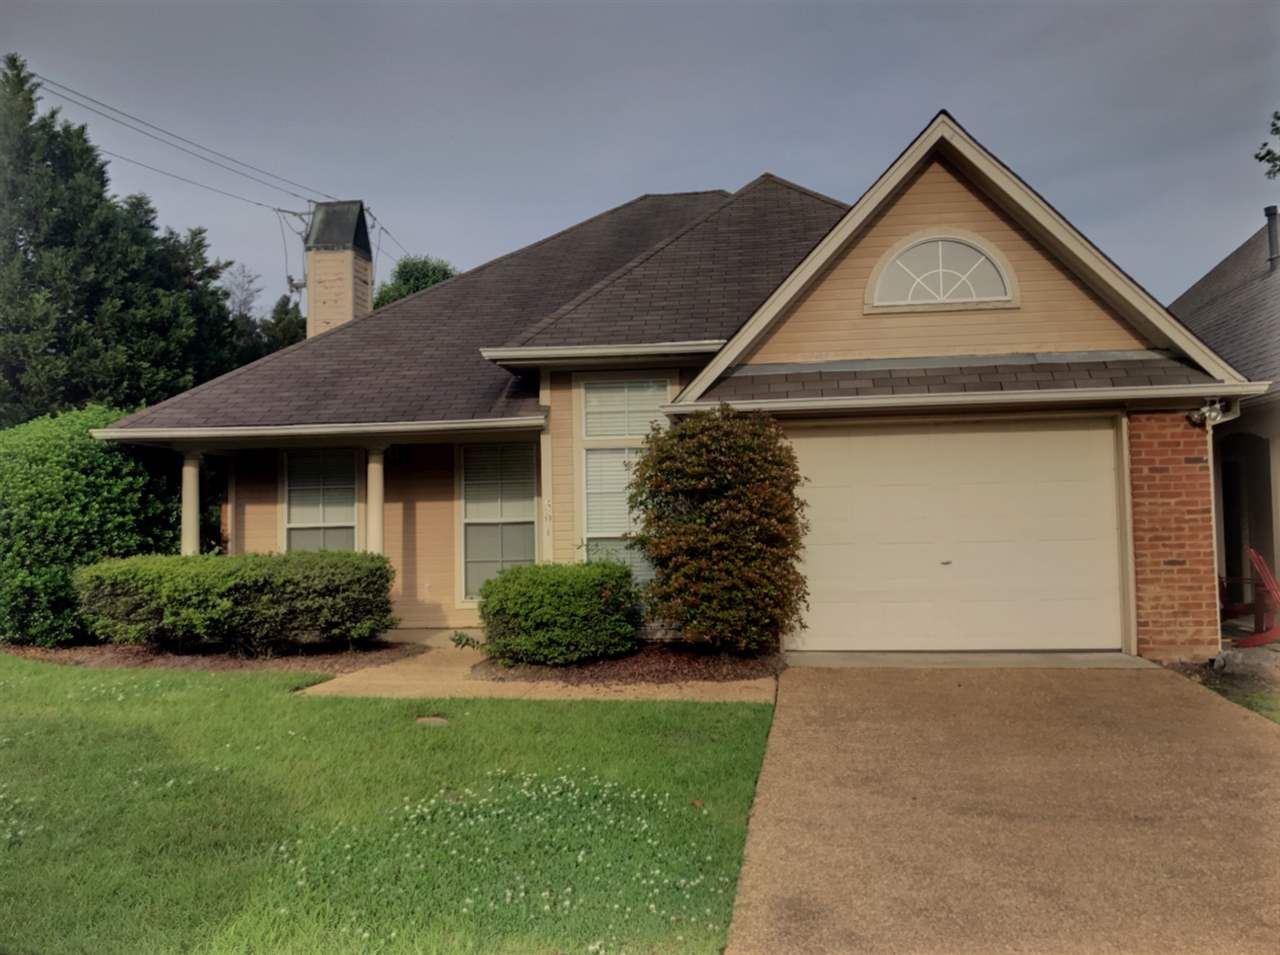 301 CRESTON CT, Ridgeland, MS 39157 - MLS#: 339684